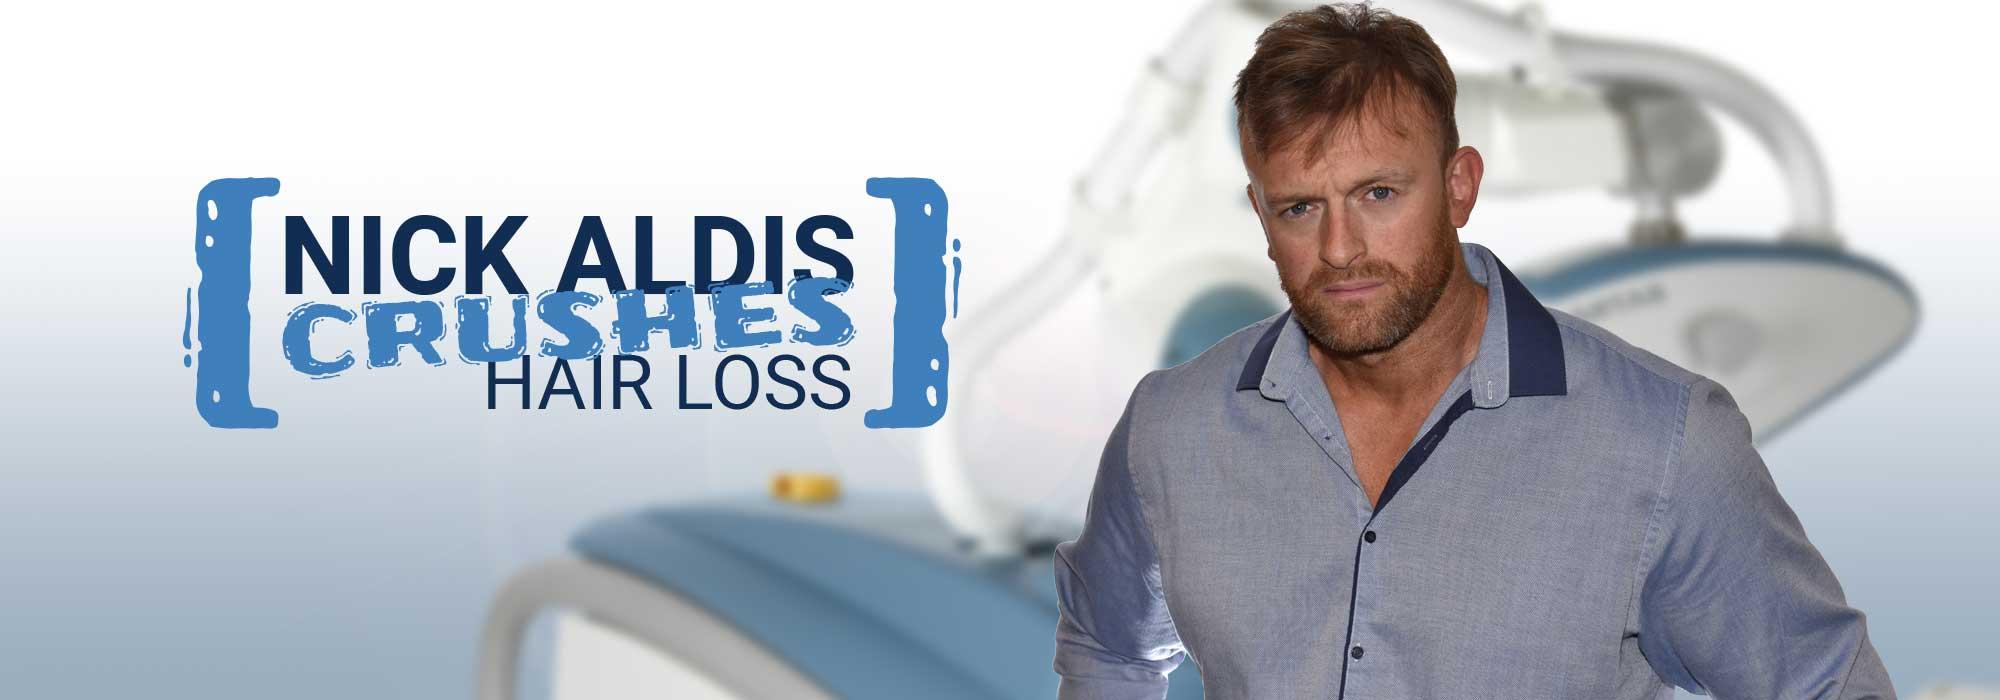 Nick Aldis Gets a Hair Transplant